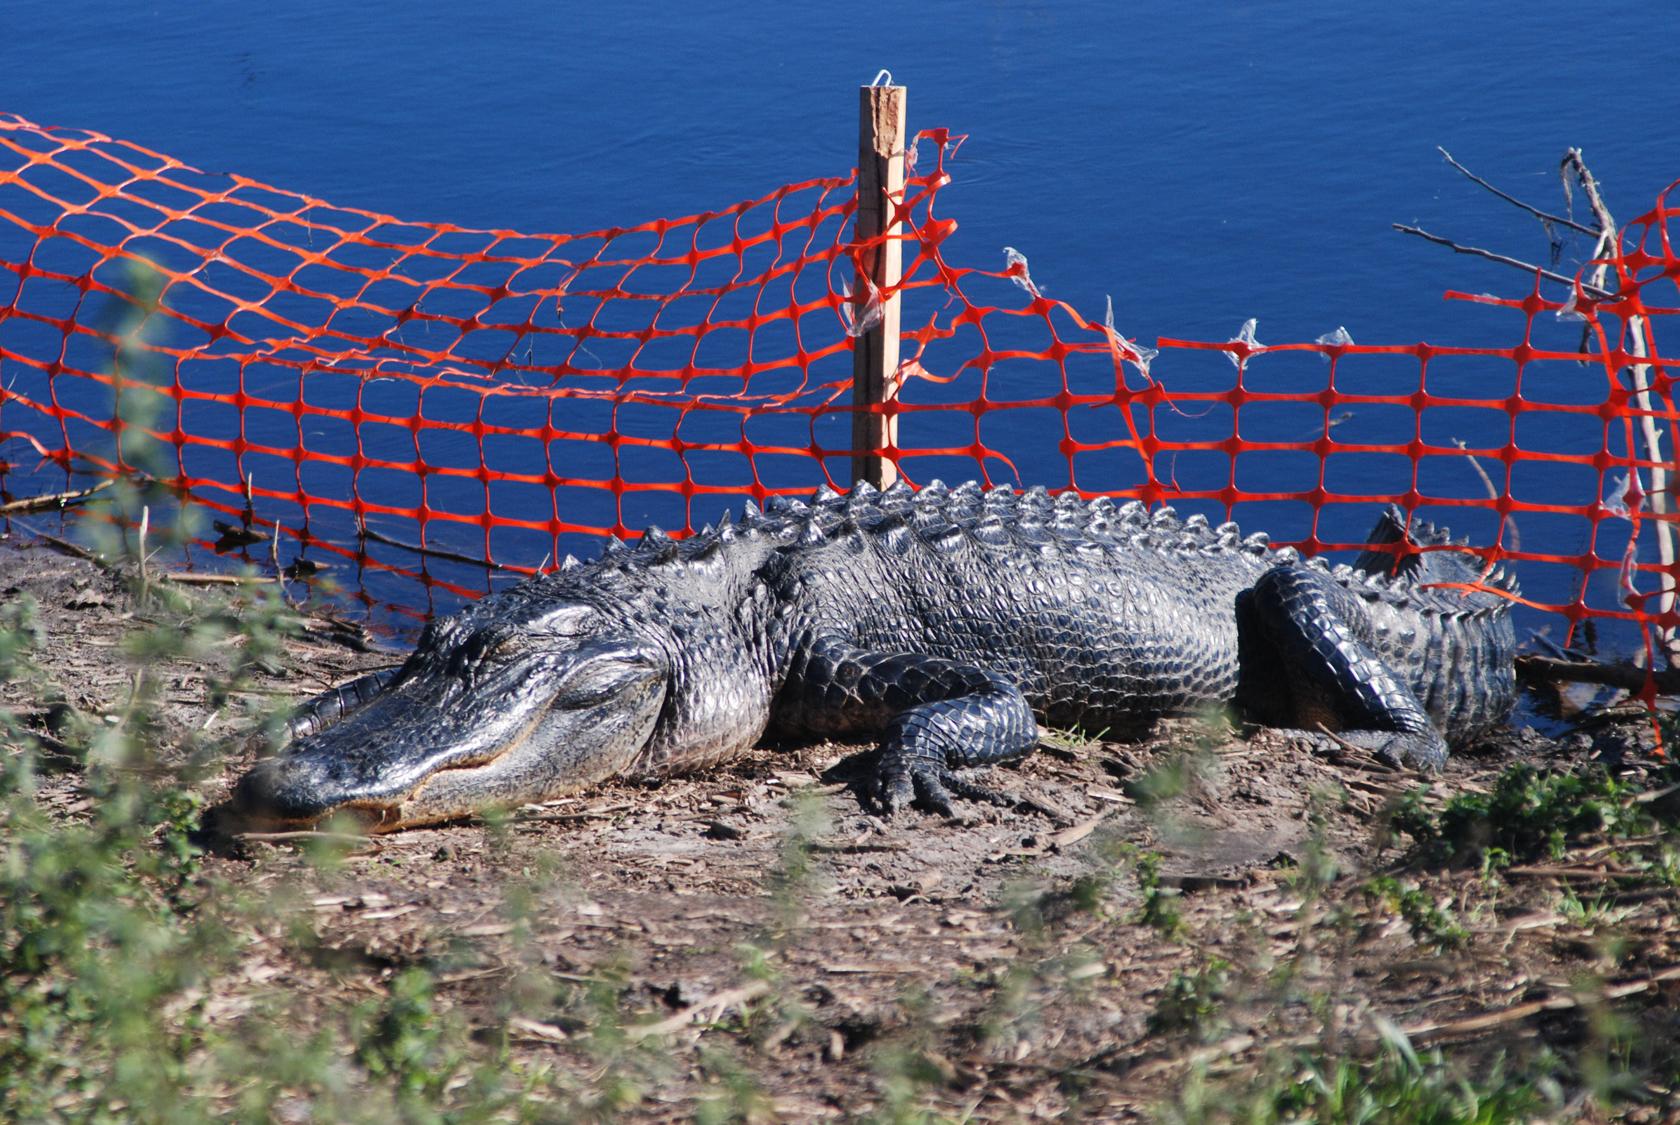 La Chua alligator